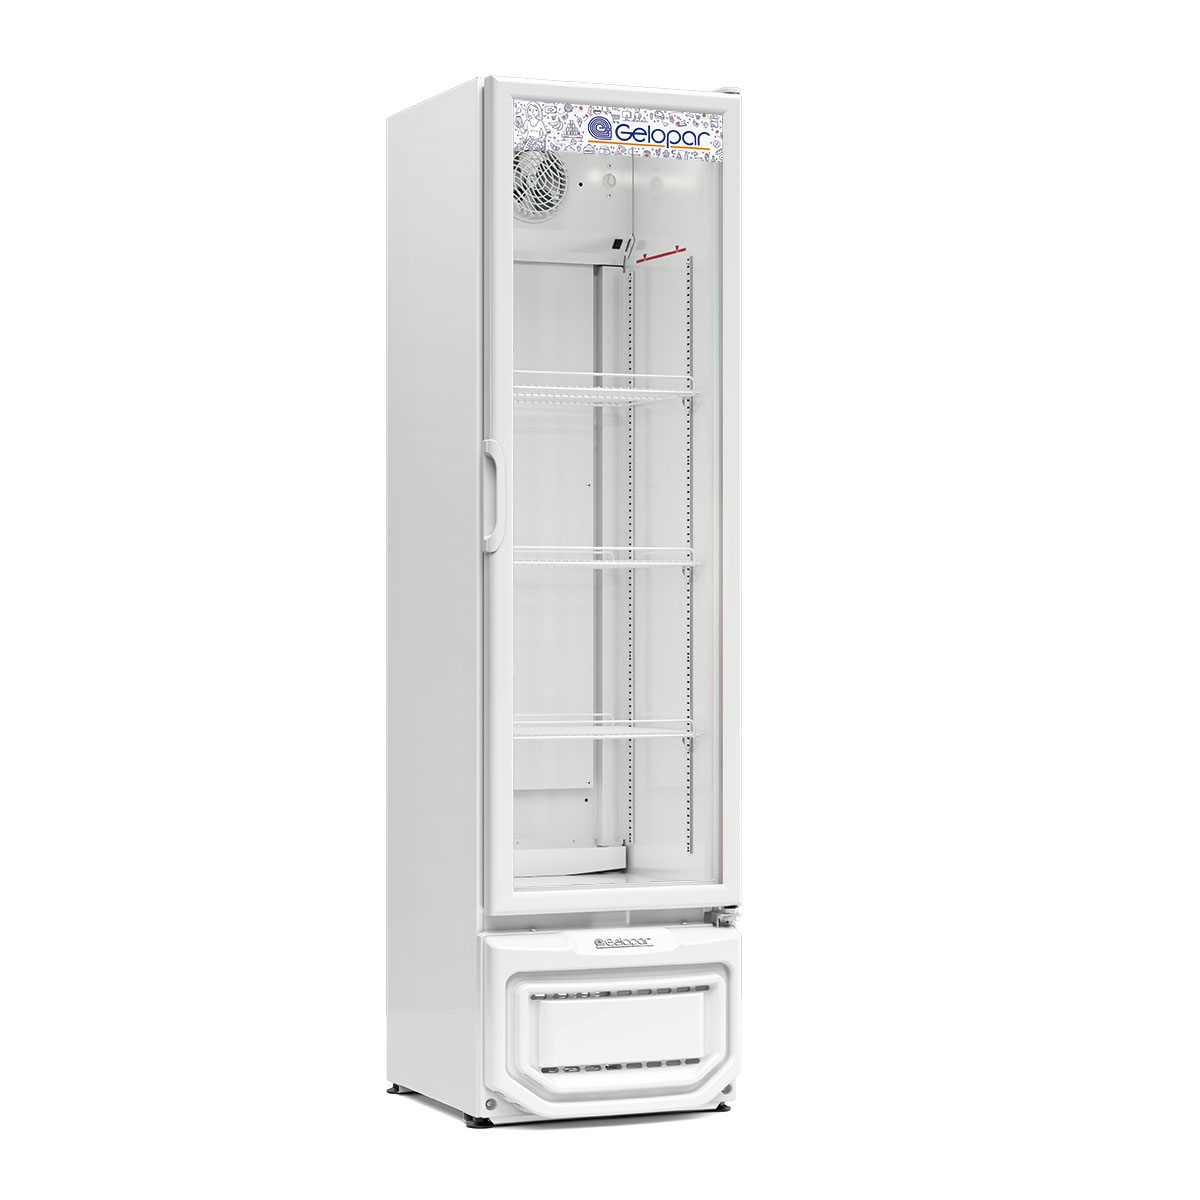 Refrigerador Visa Cooler 230 Litros Branco Gelopar - GPTU-230 BR